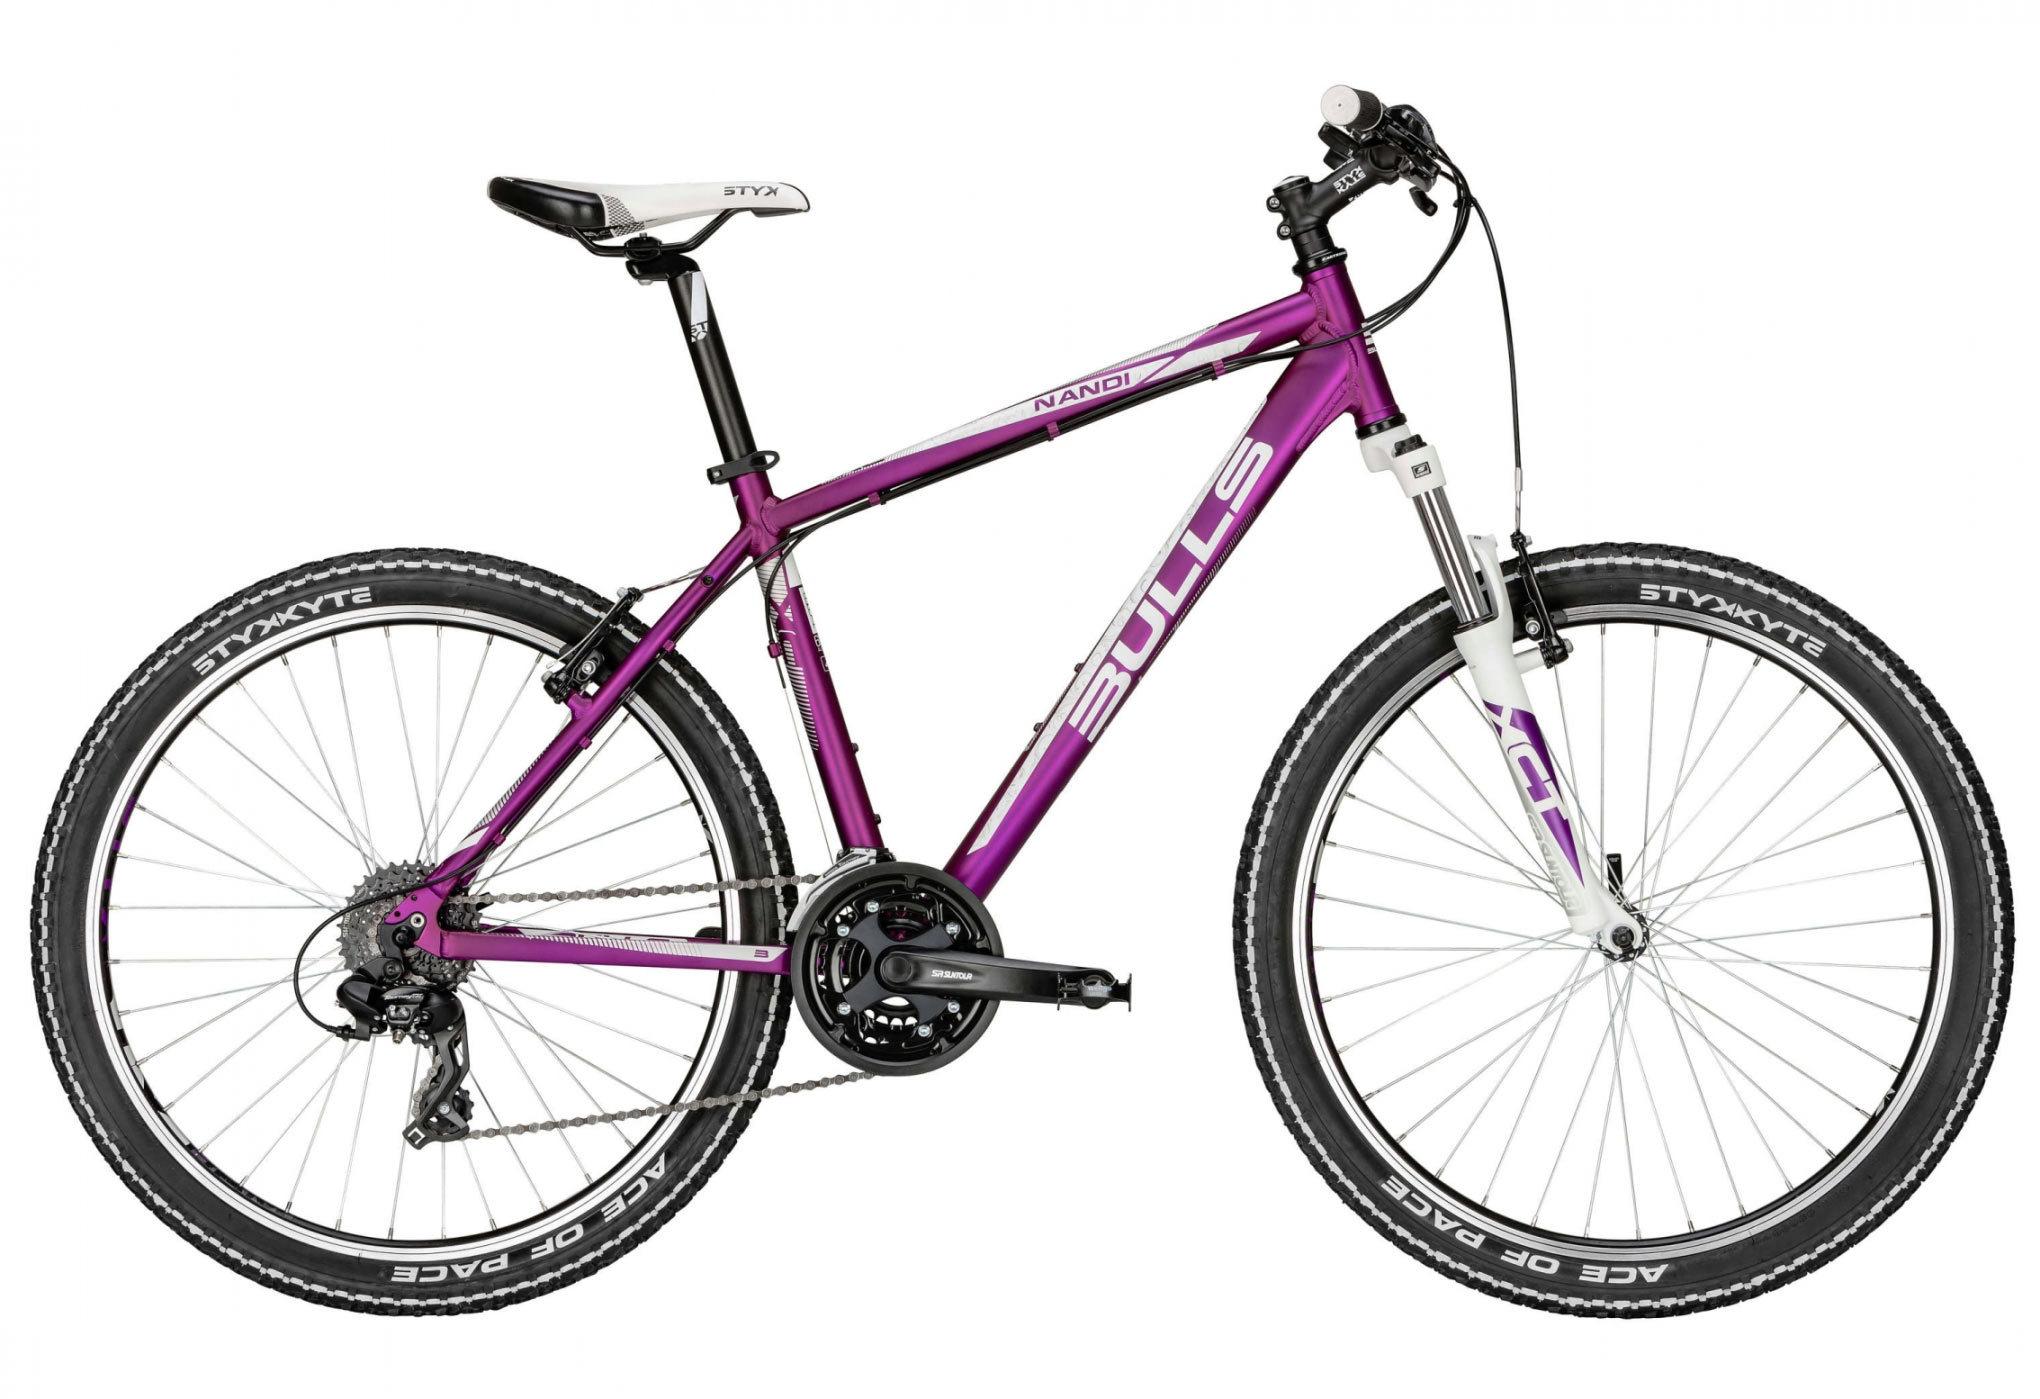 bulls nandi damen mountainbike mtb fahrrad shimano 24g 41. Black Bedroom Furniture Sets. Home Design Ideas